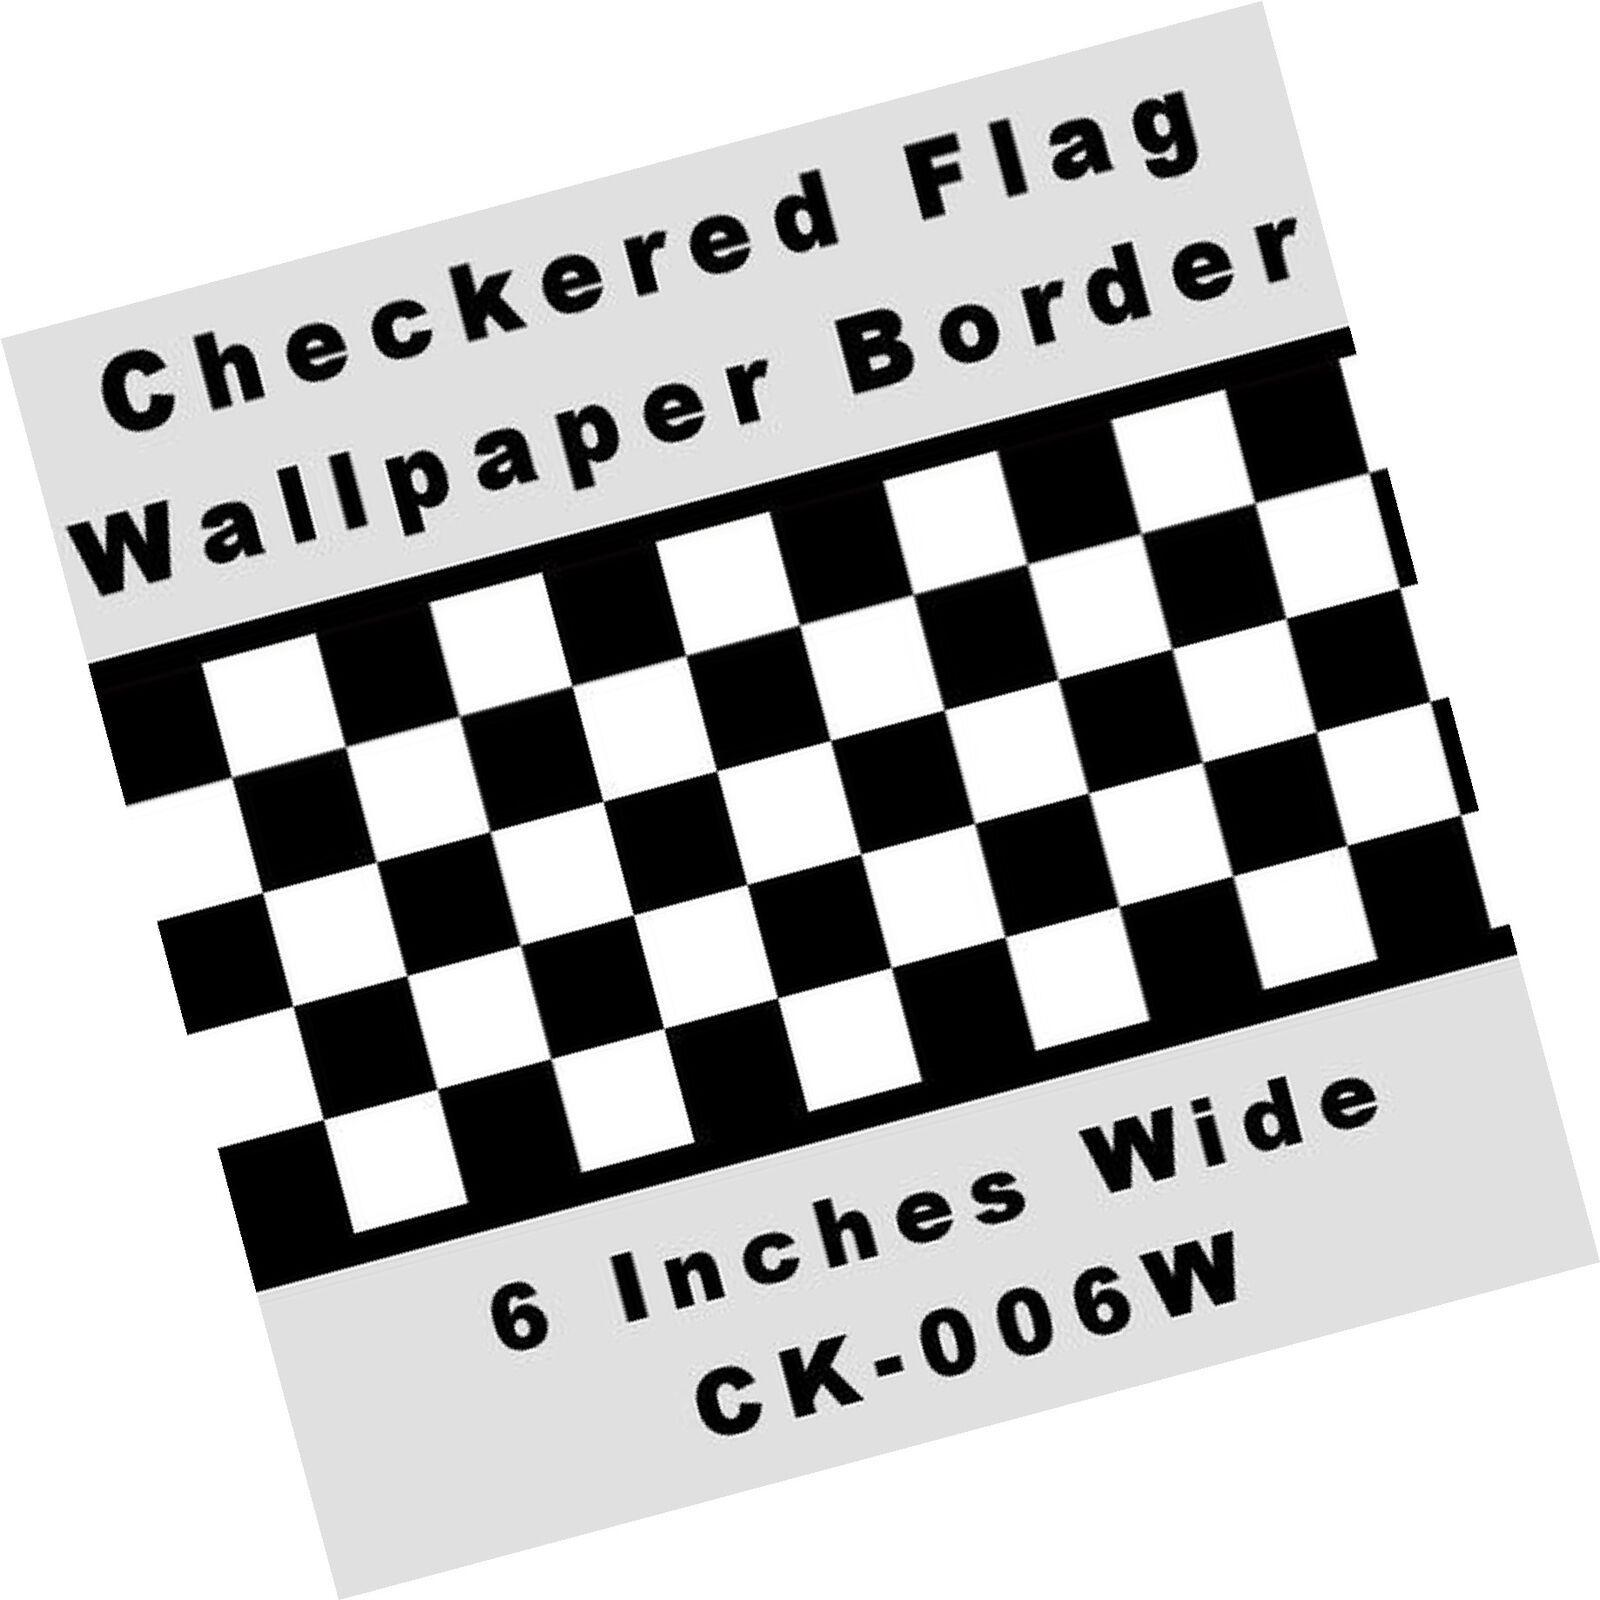 Checkered Flag Cars Nascar Wallpaper Border 6 Inch Black Edge 741360437951 Ebay Wallpaper Border Checkered Flag Checkerboard Pattern